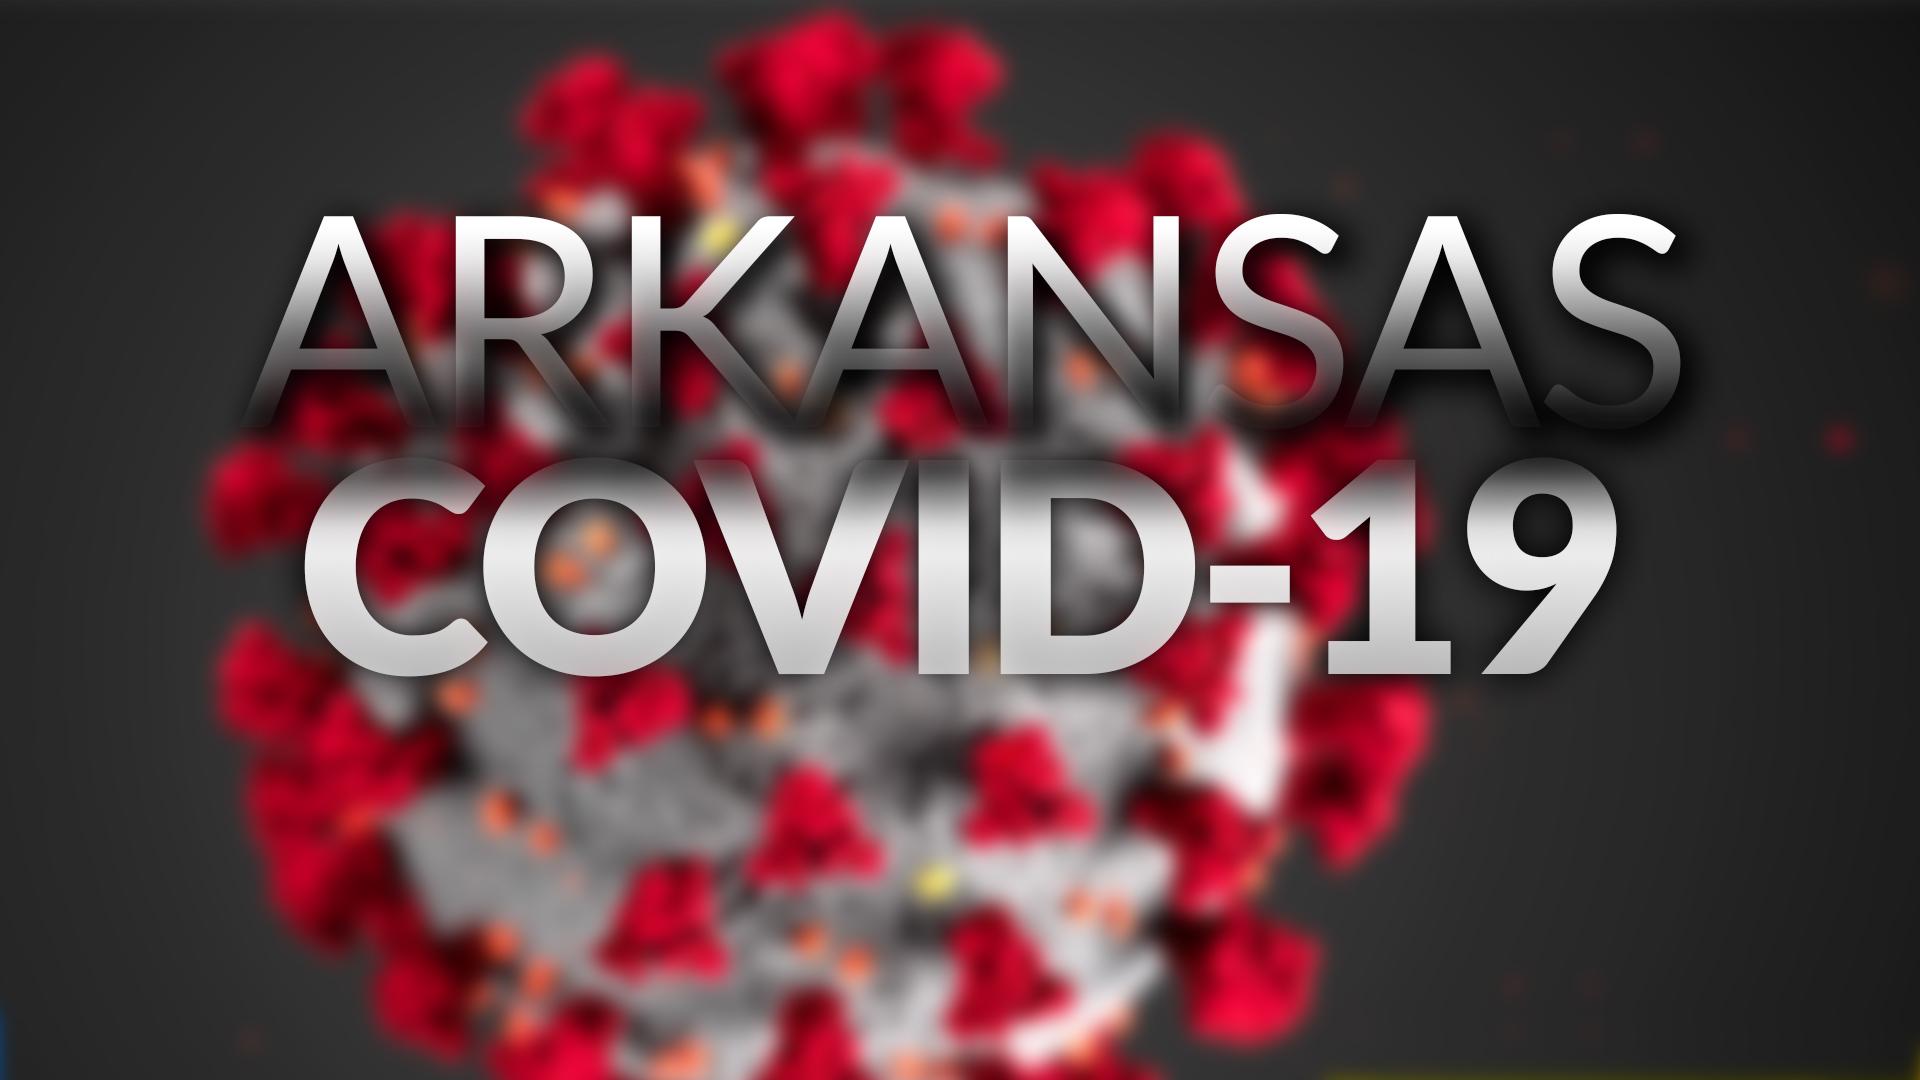 ADH reports 37 total positive coronavirus cases in Arkansas